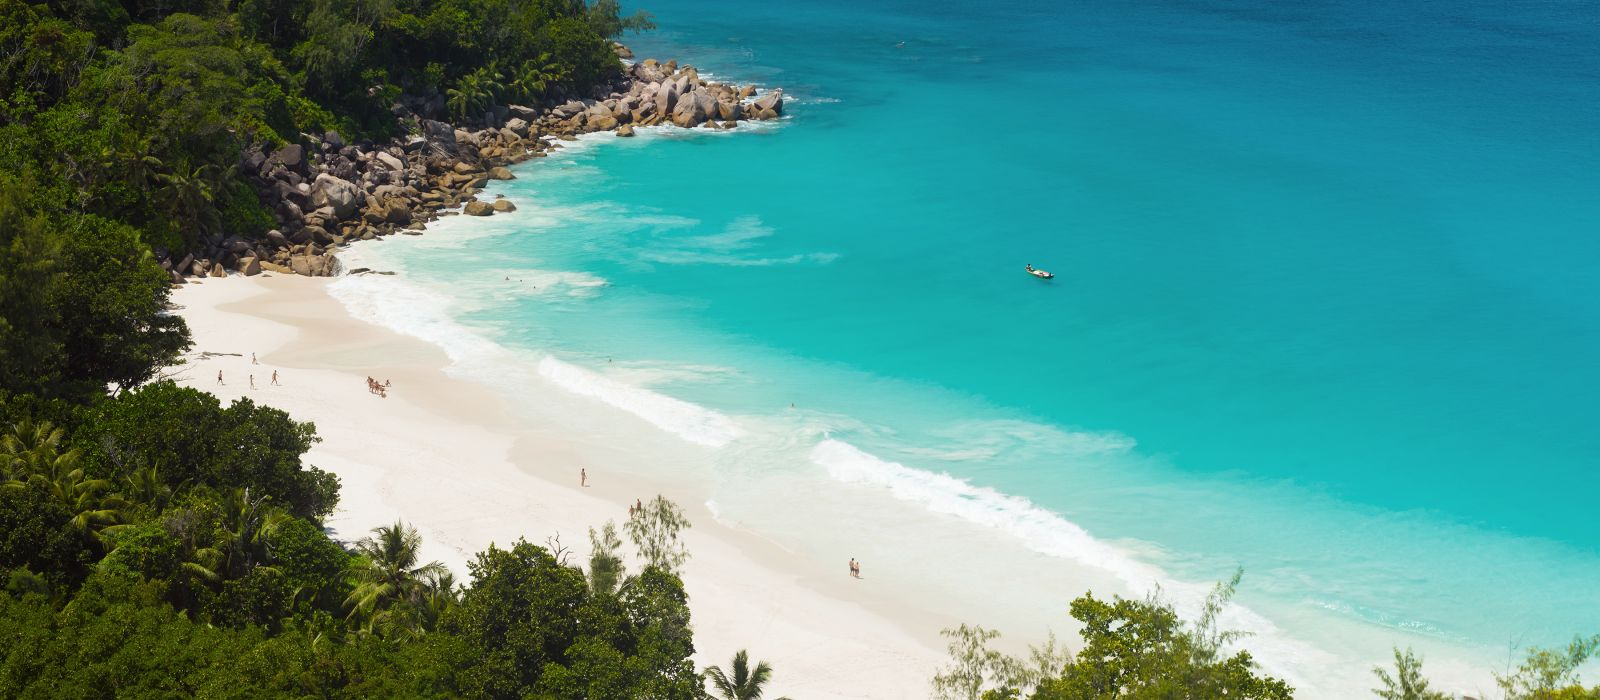 Seychellen: Inselparadies & The Moorings Kreuzfahrt Urlaub 5